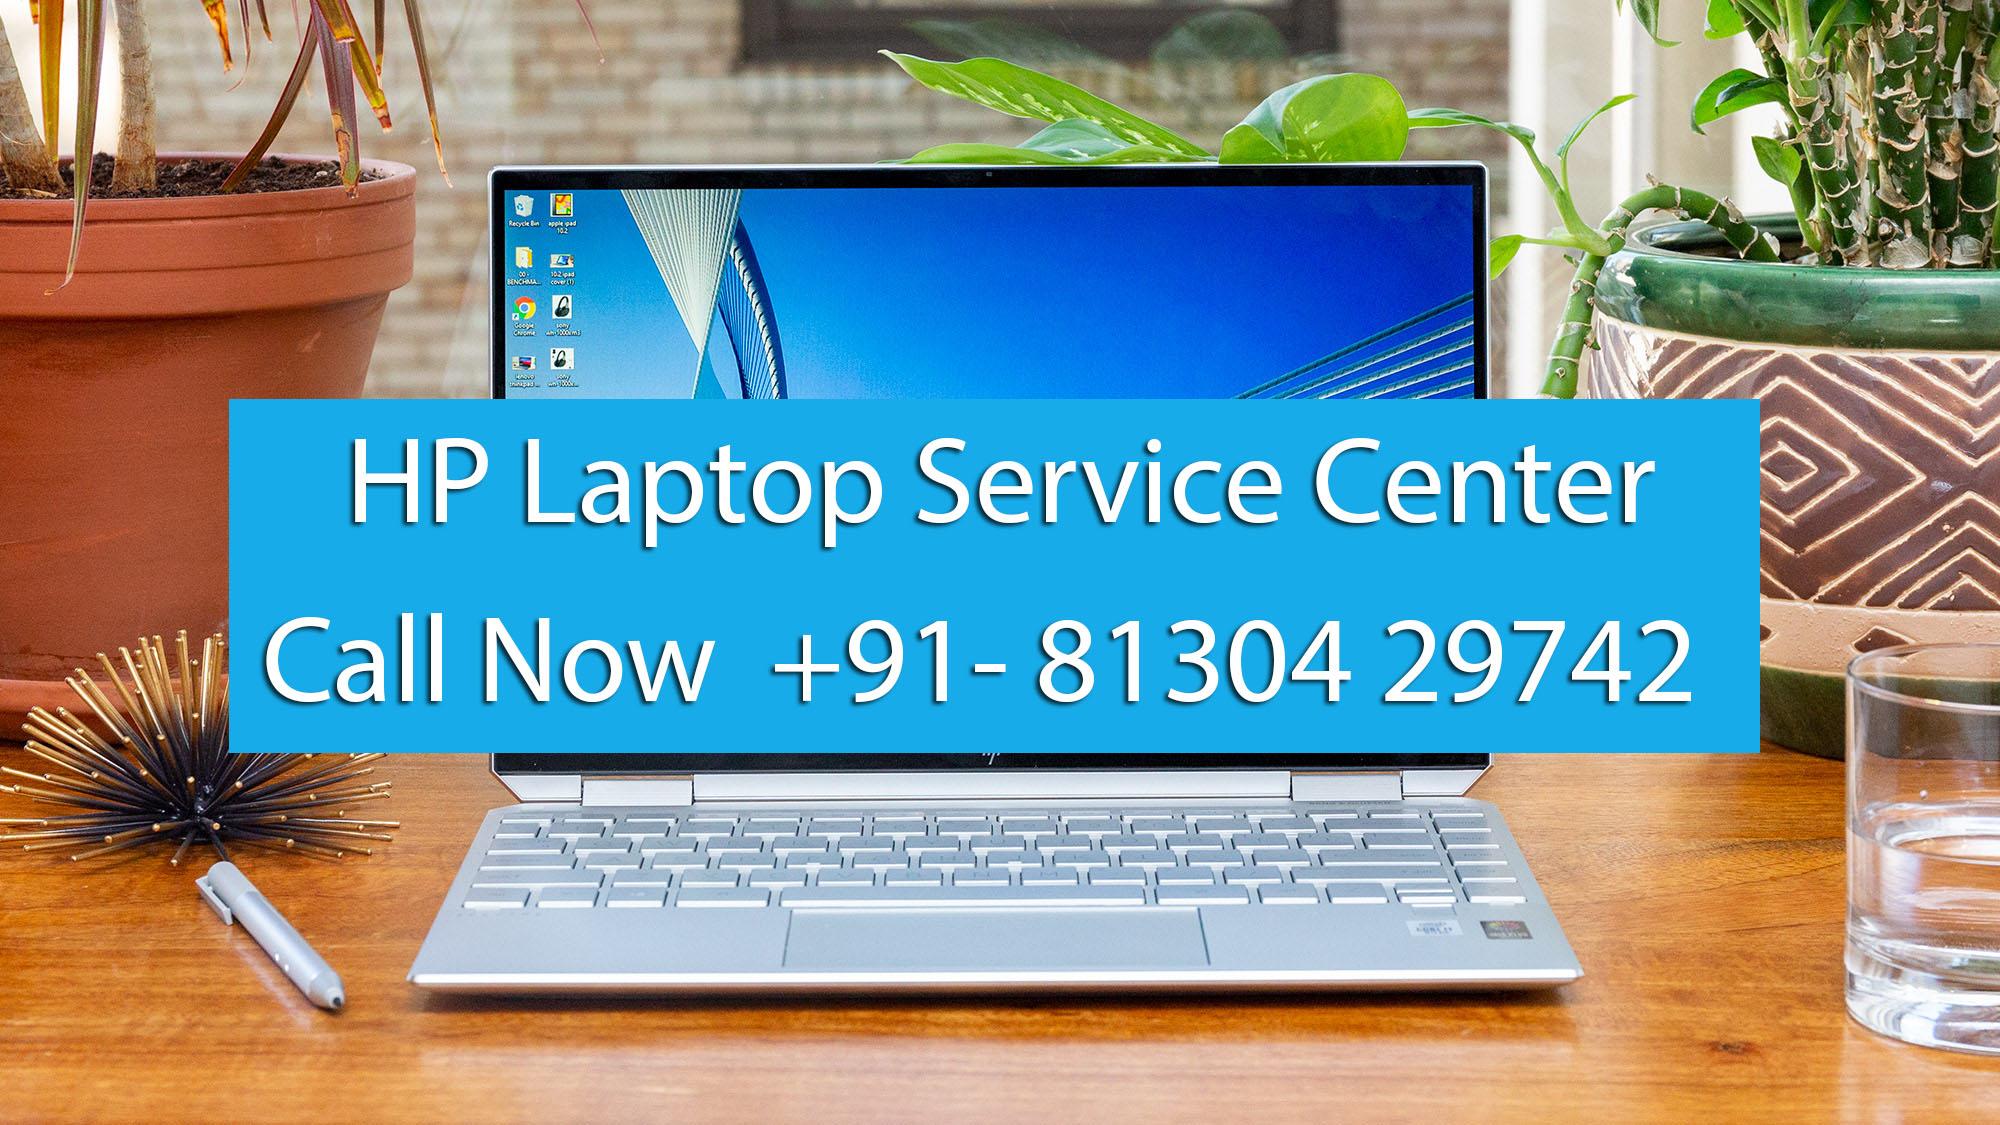 Hp service center in Goregaon